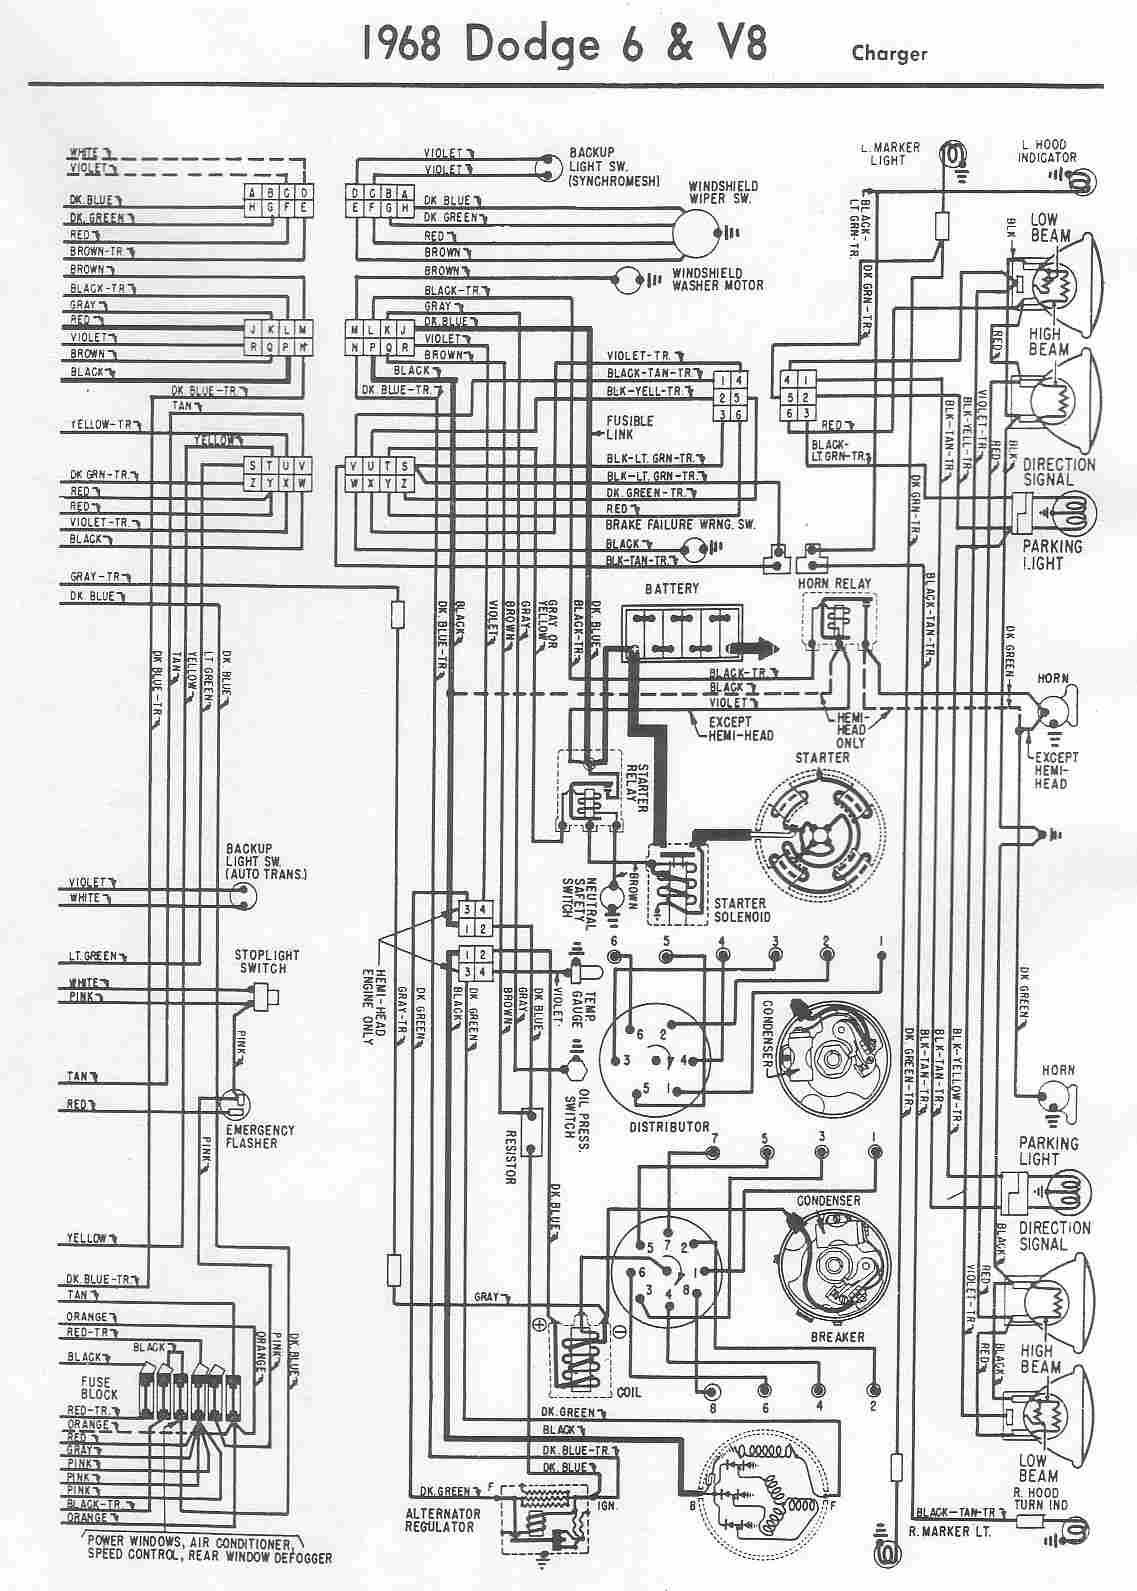 2002 Wrx Engine Diagram 02